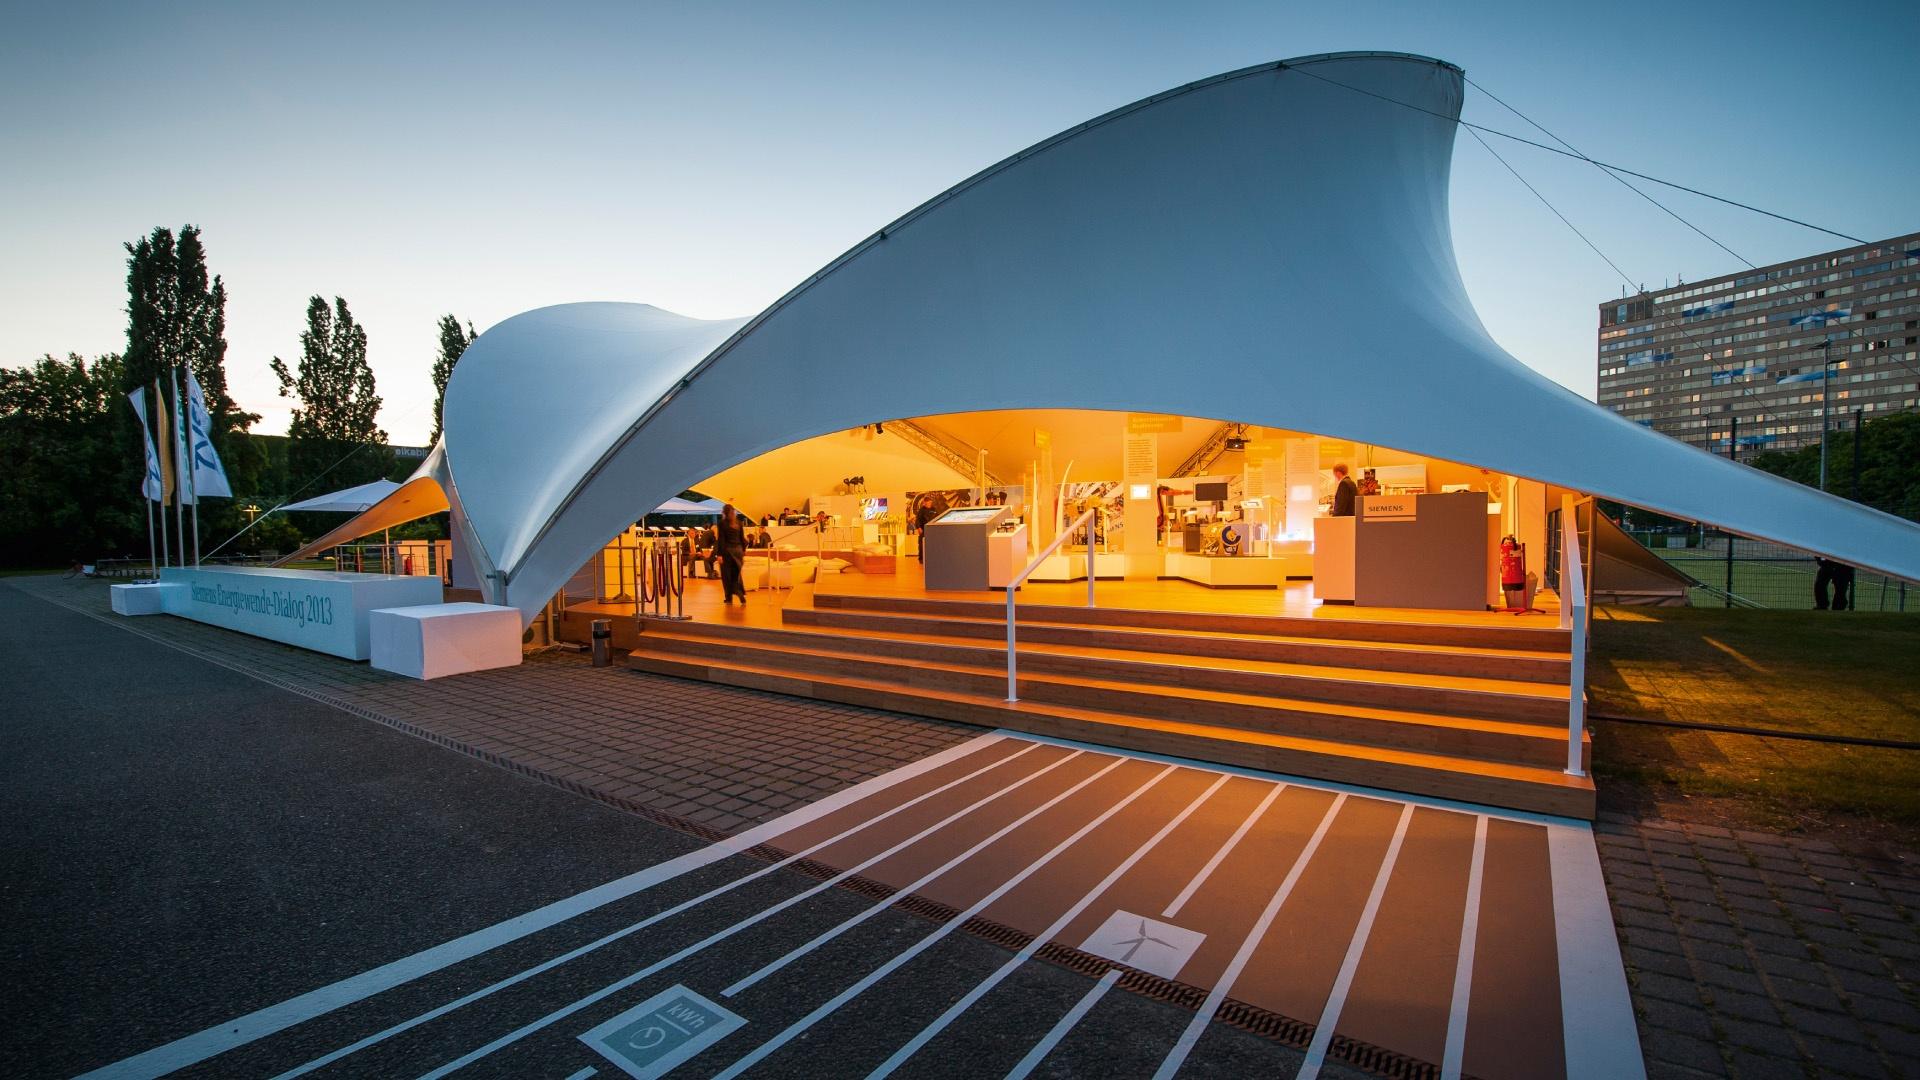 Pavillon Siemens Energiewende